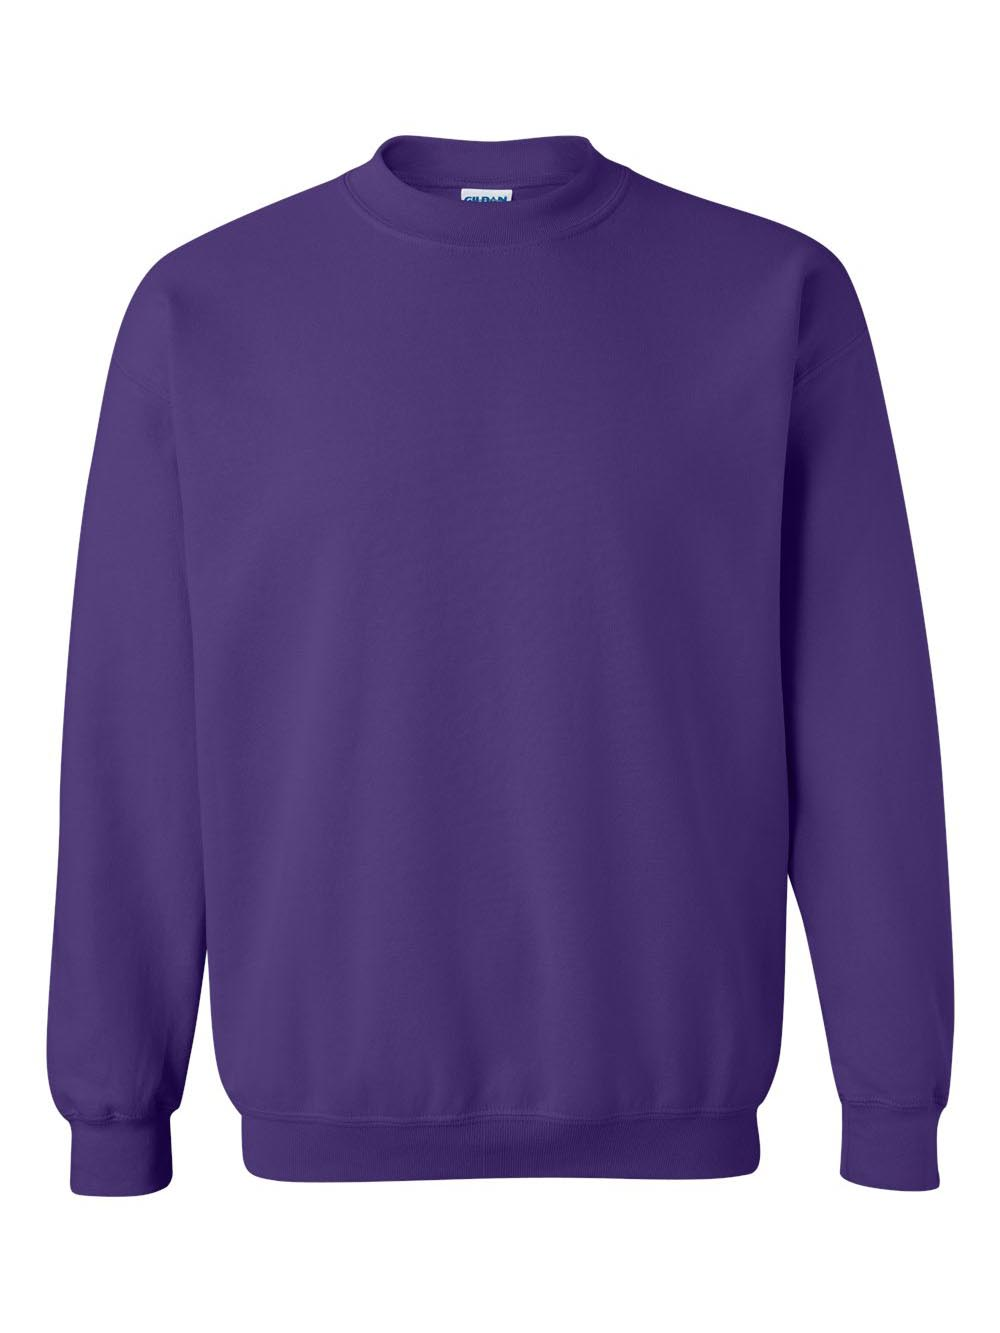 Gildan Fleece Heavy Blend Crewneck Sweatshirt